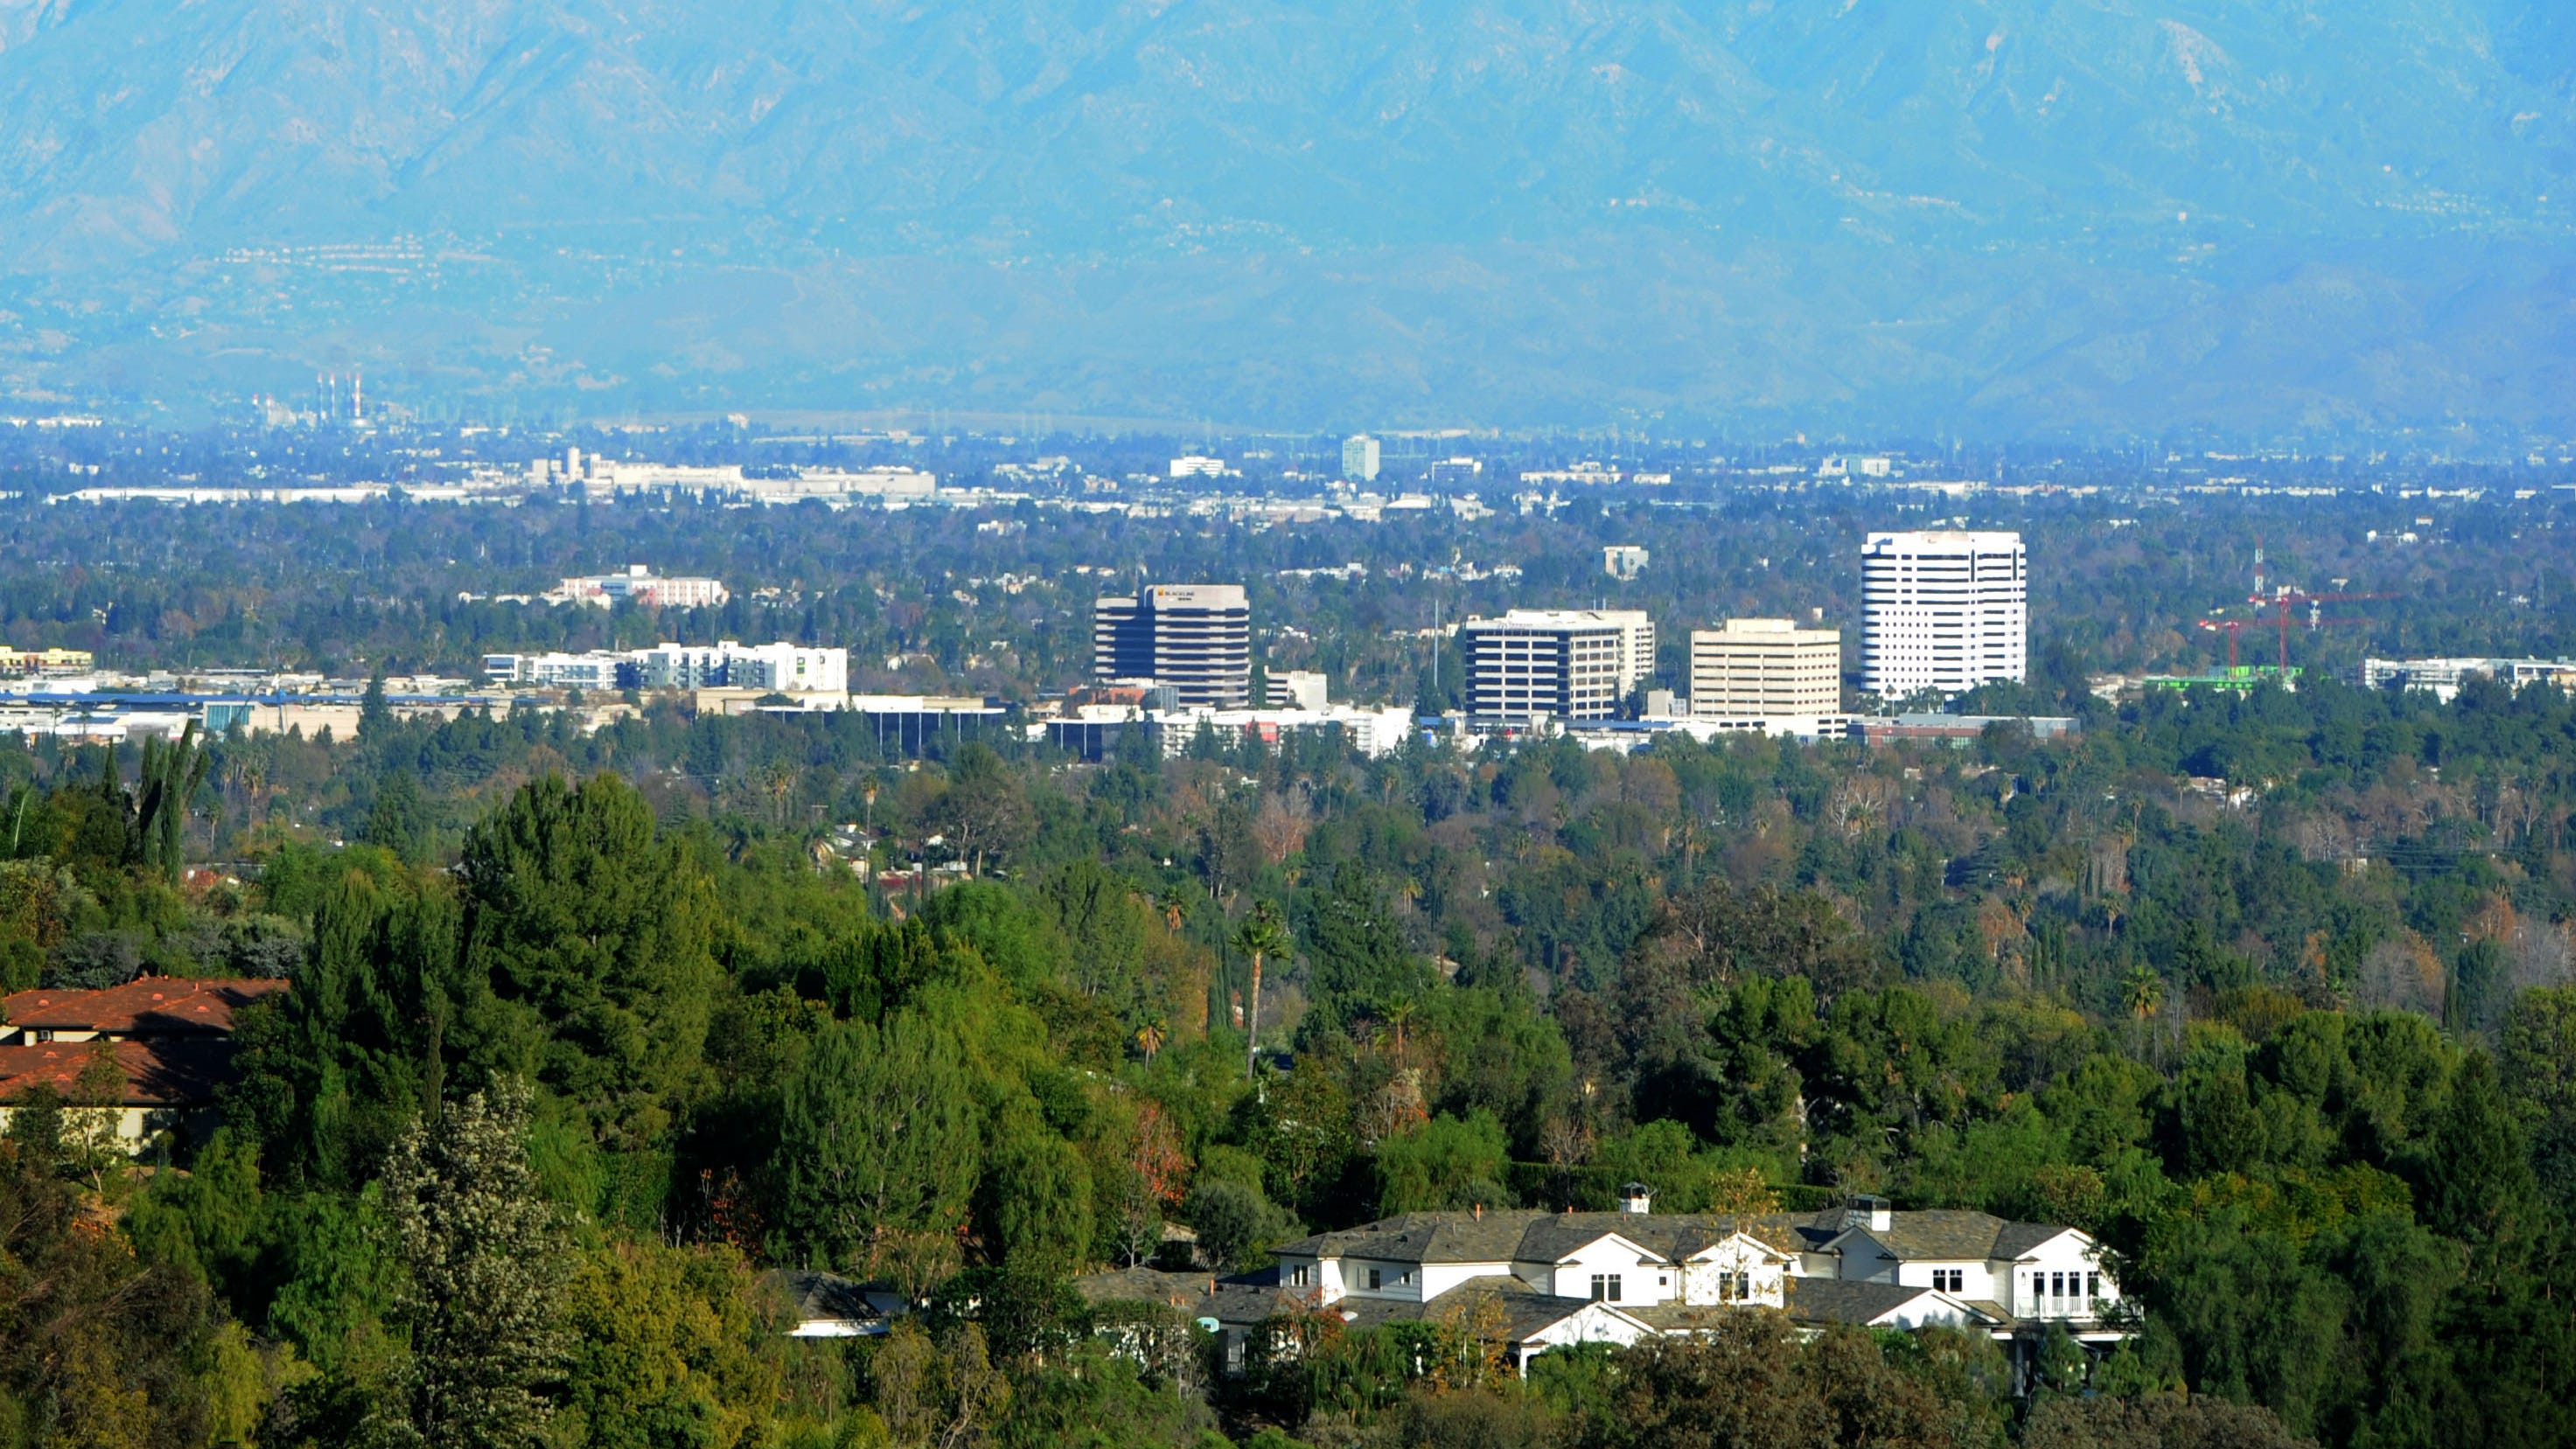 Housing Ventura County, San Fernando Valley comparisons get pushback